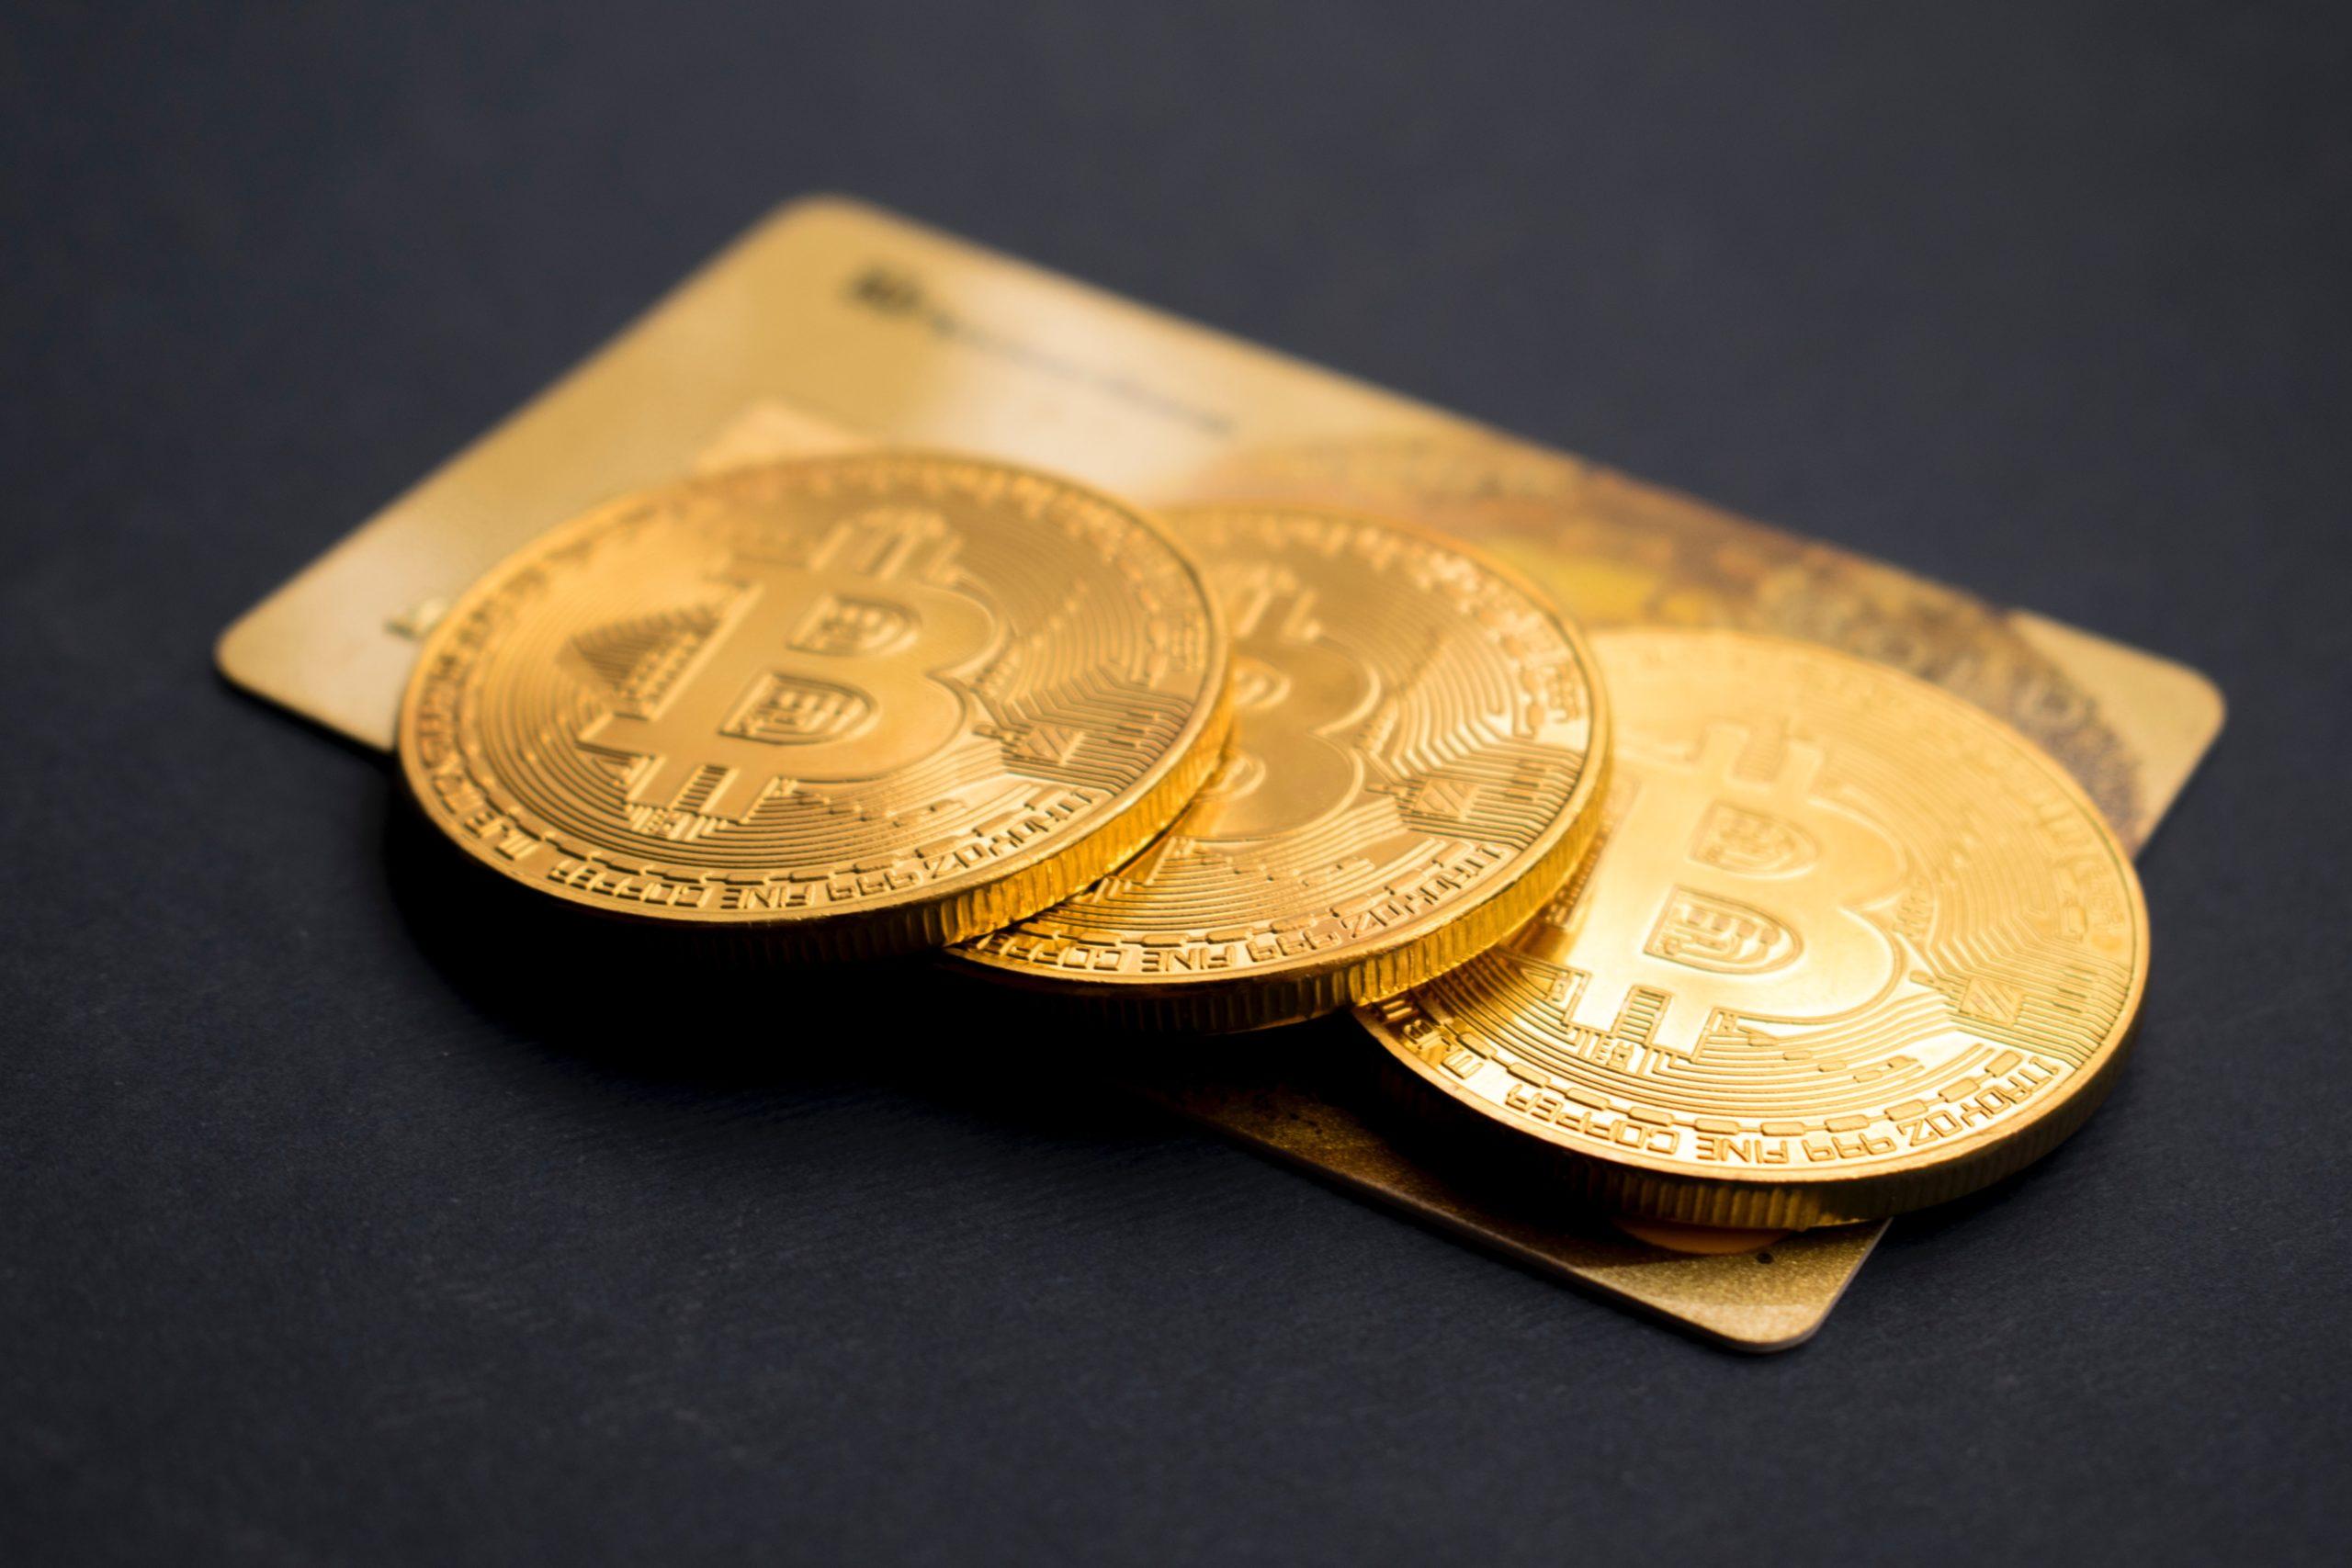 Bitcoin : le big boss de Twitter et Jay-Z investissent à leur tour - Journal du geek